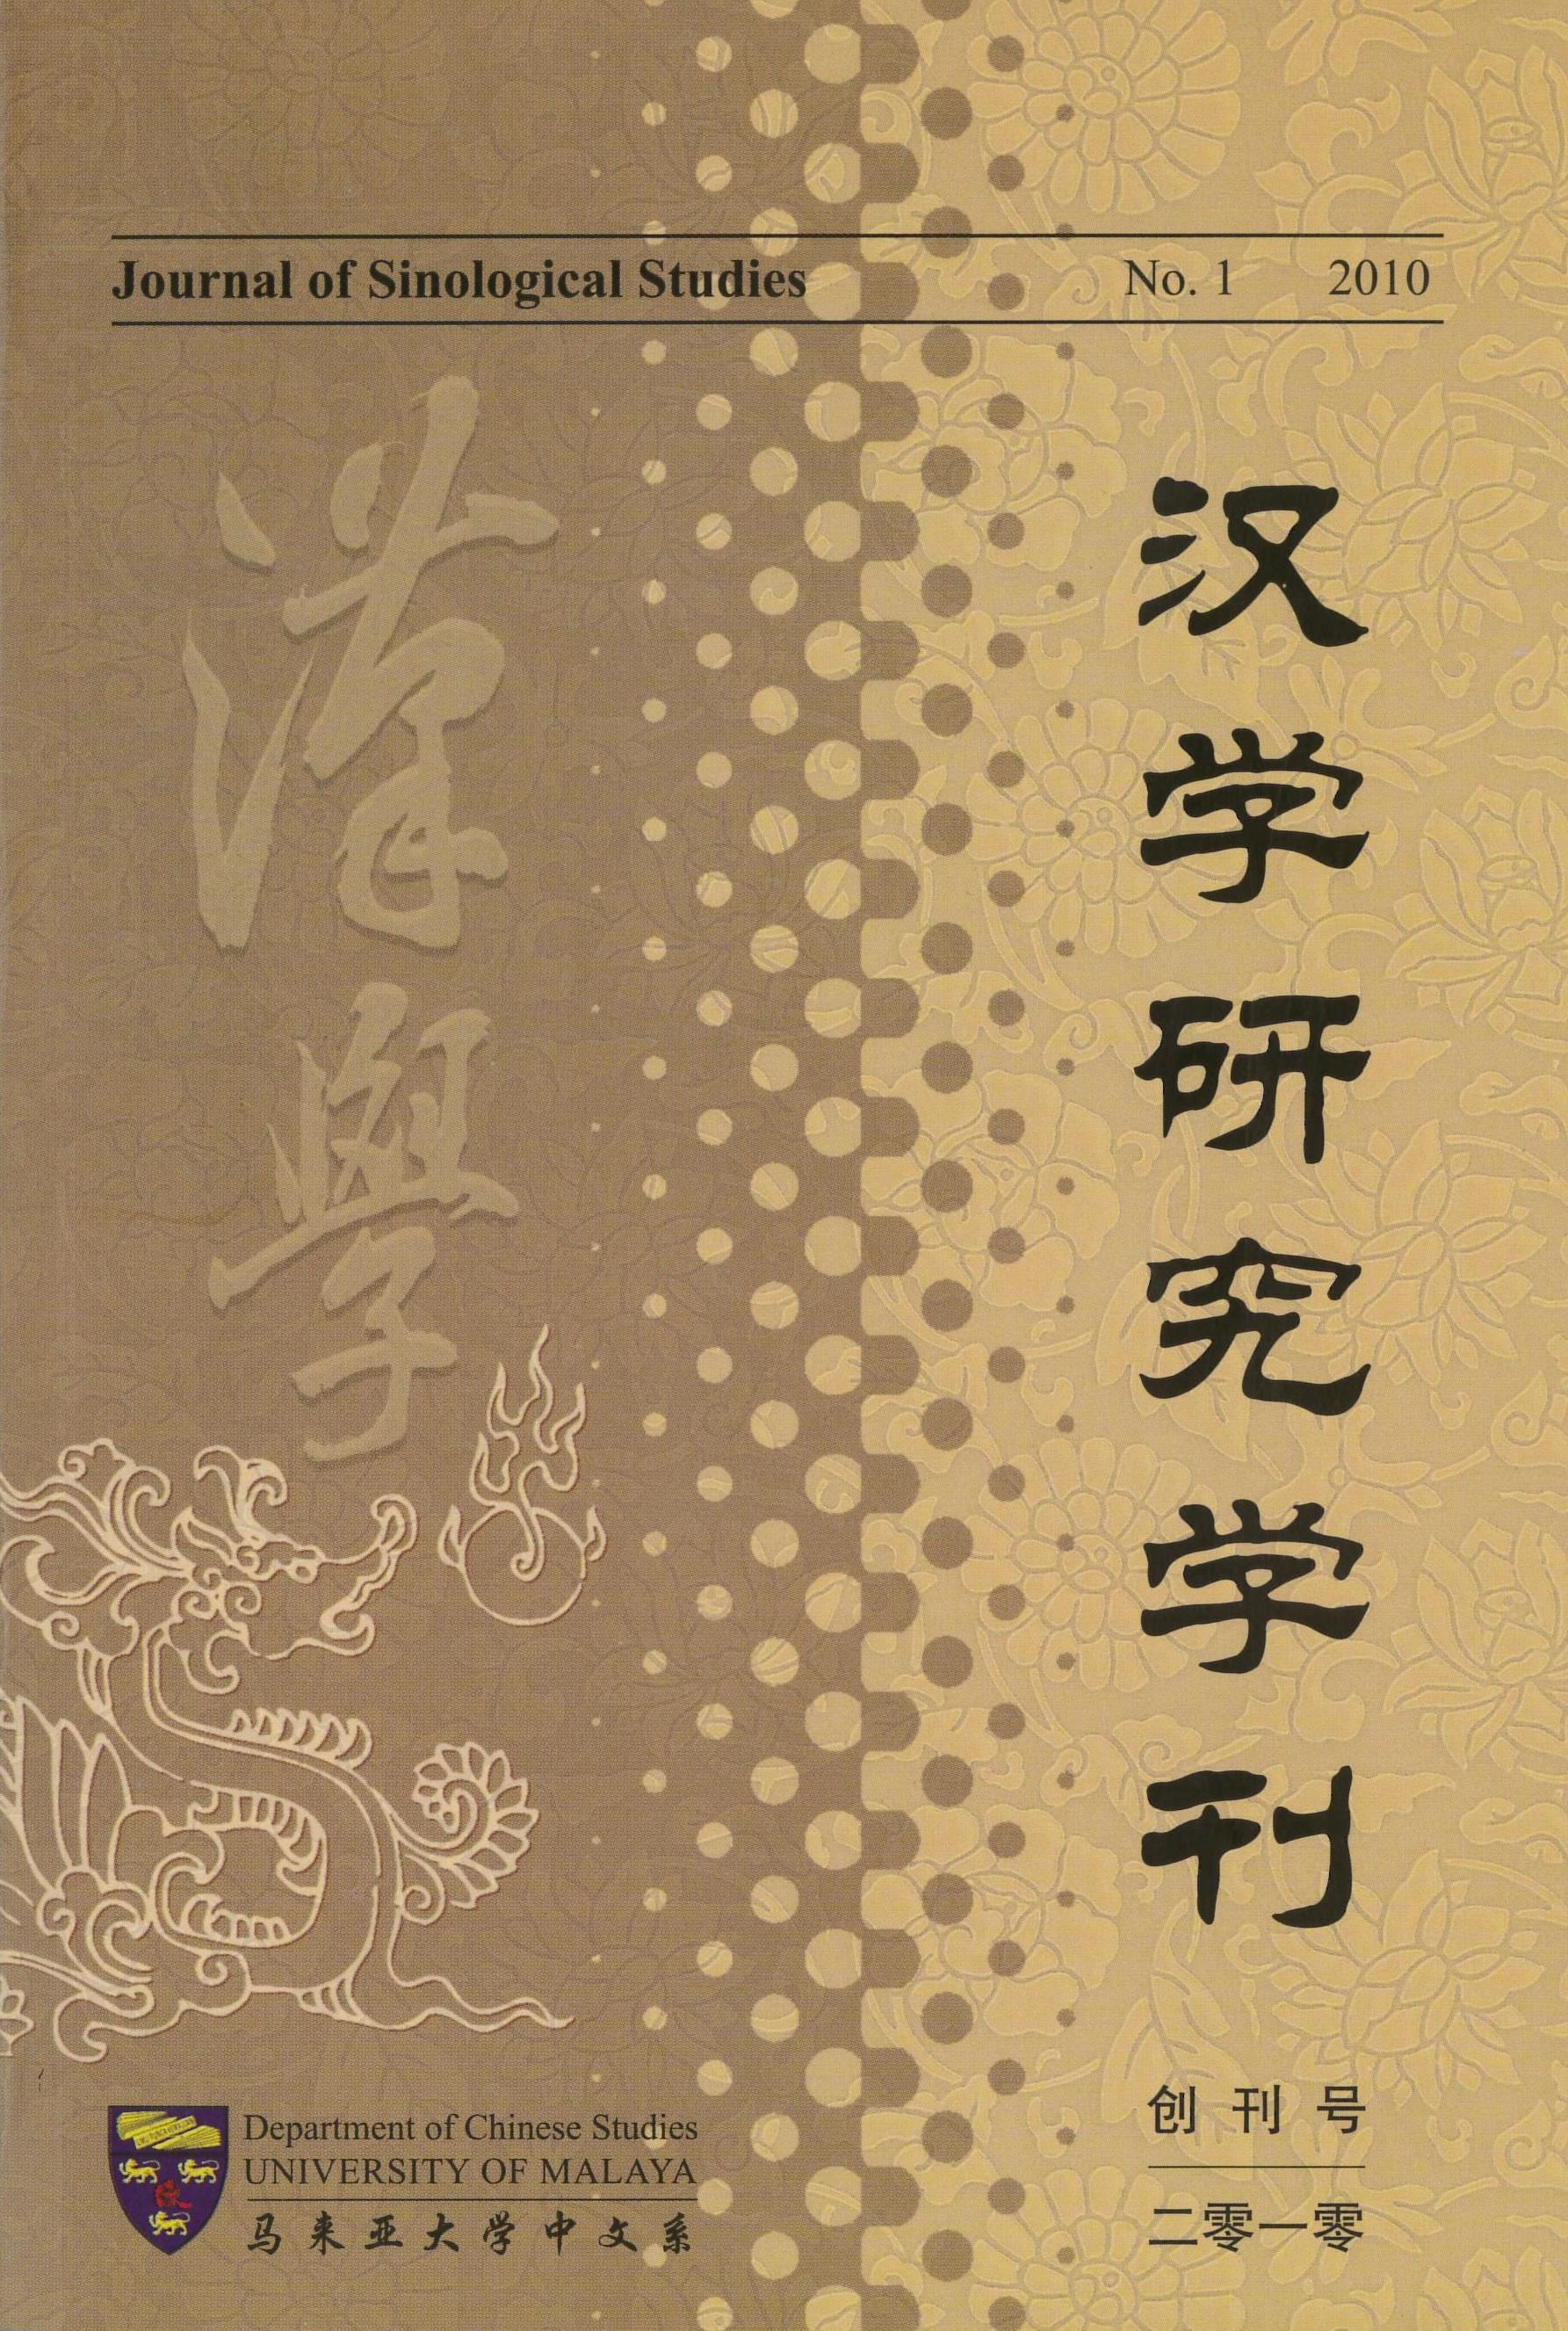 View Vol. 1 No. 1 (2010): Journal of Sinological Studies 漢學研究學刊